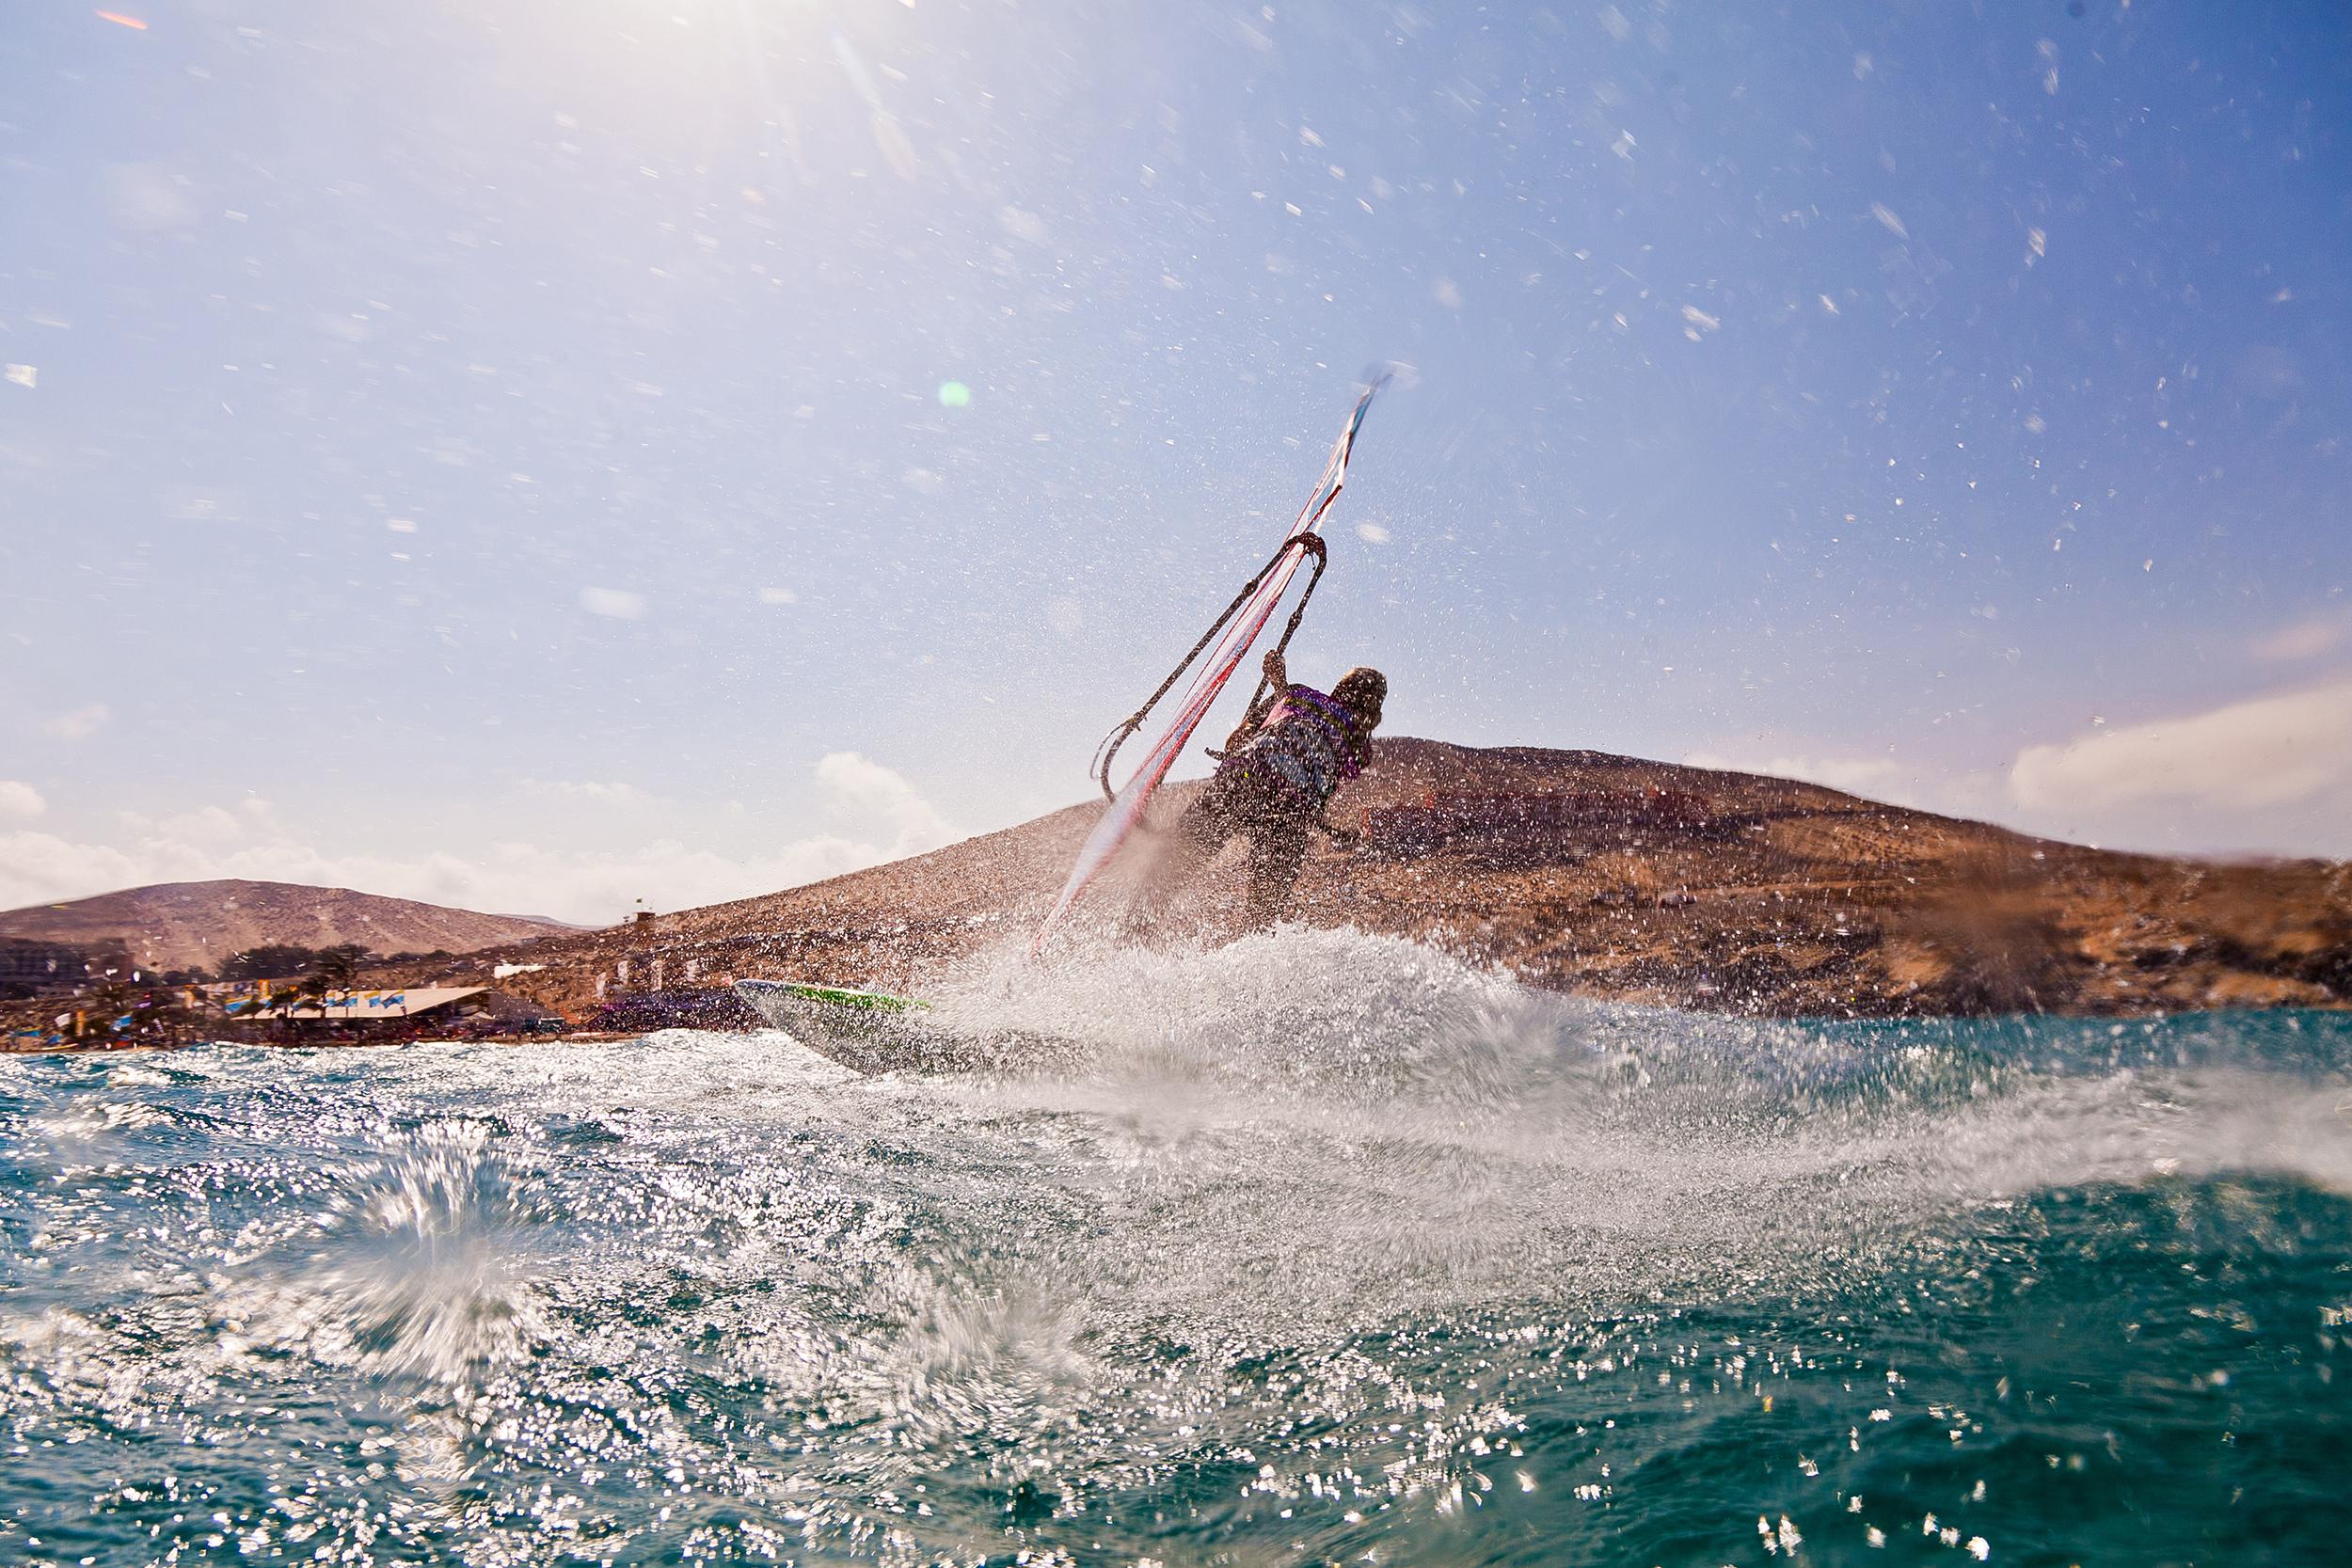 Windsurfer rides a wave